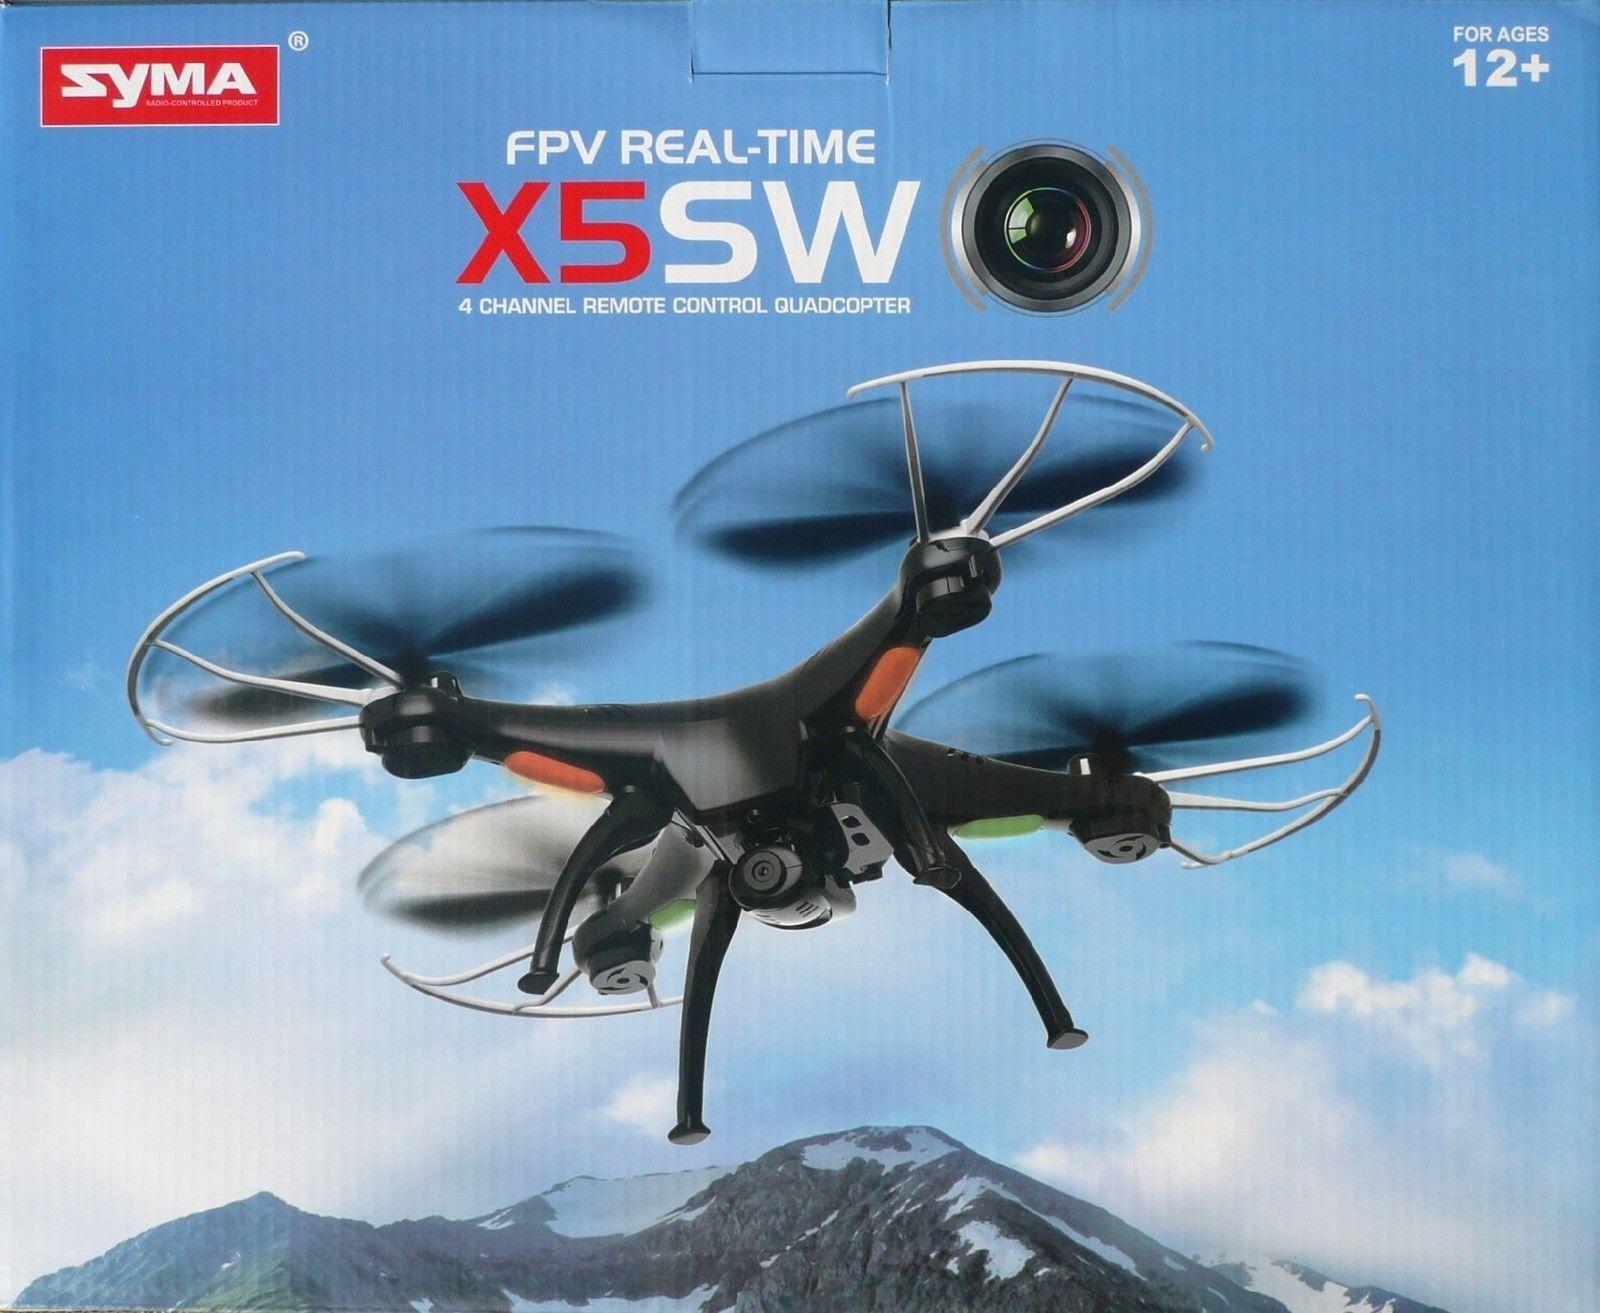 NEU Syma X5SW FPV Quadrocopter mit HD Kamera 2MP & Live-Übertragung DROHNE schwarz